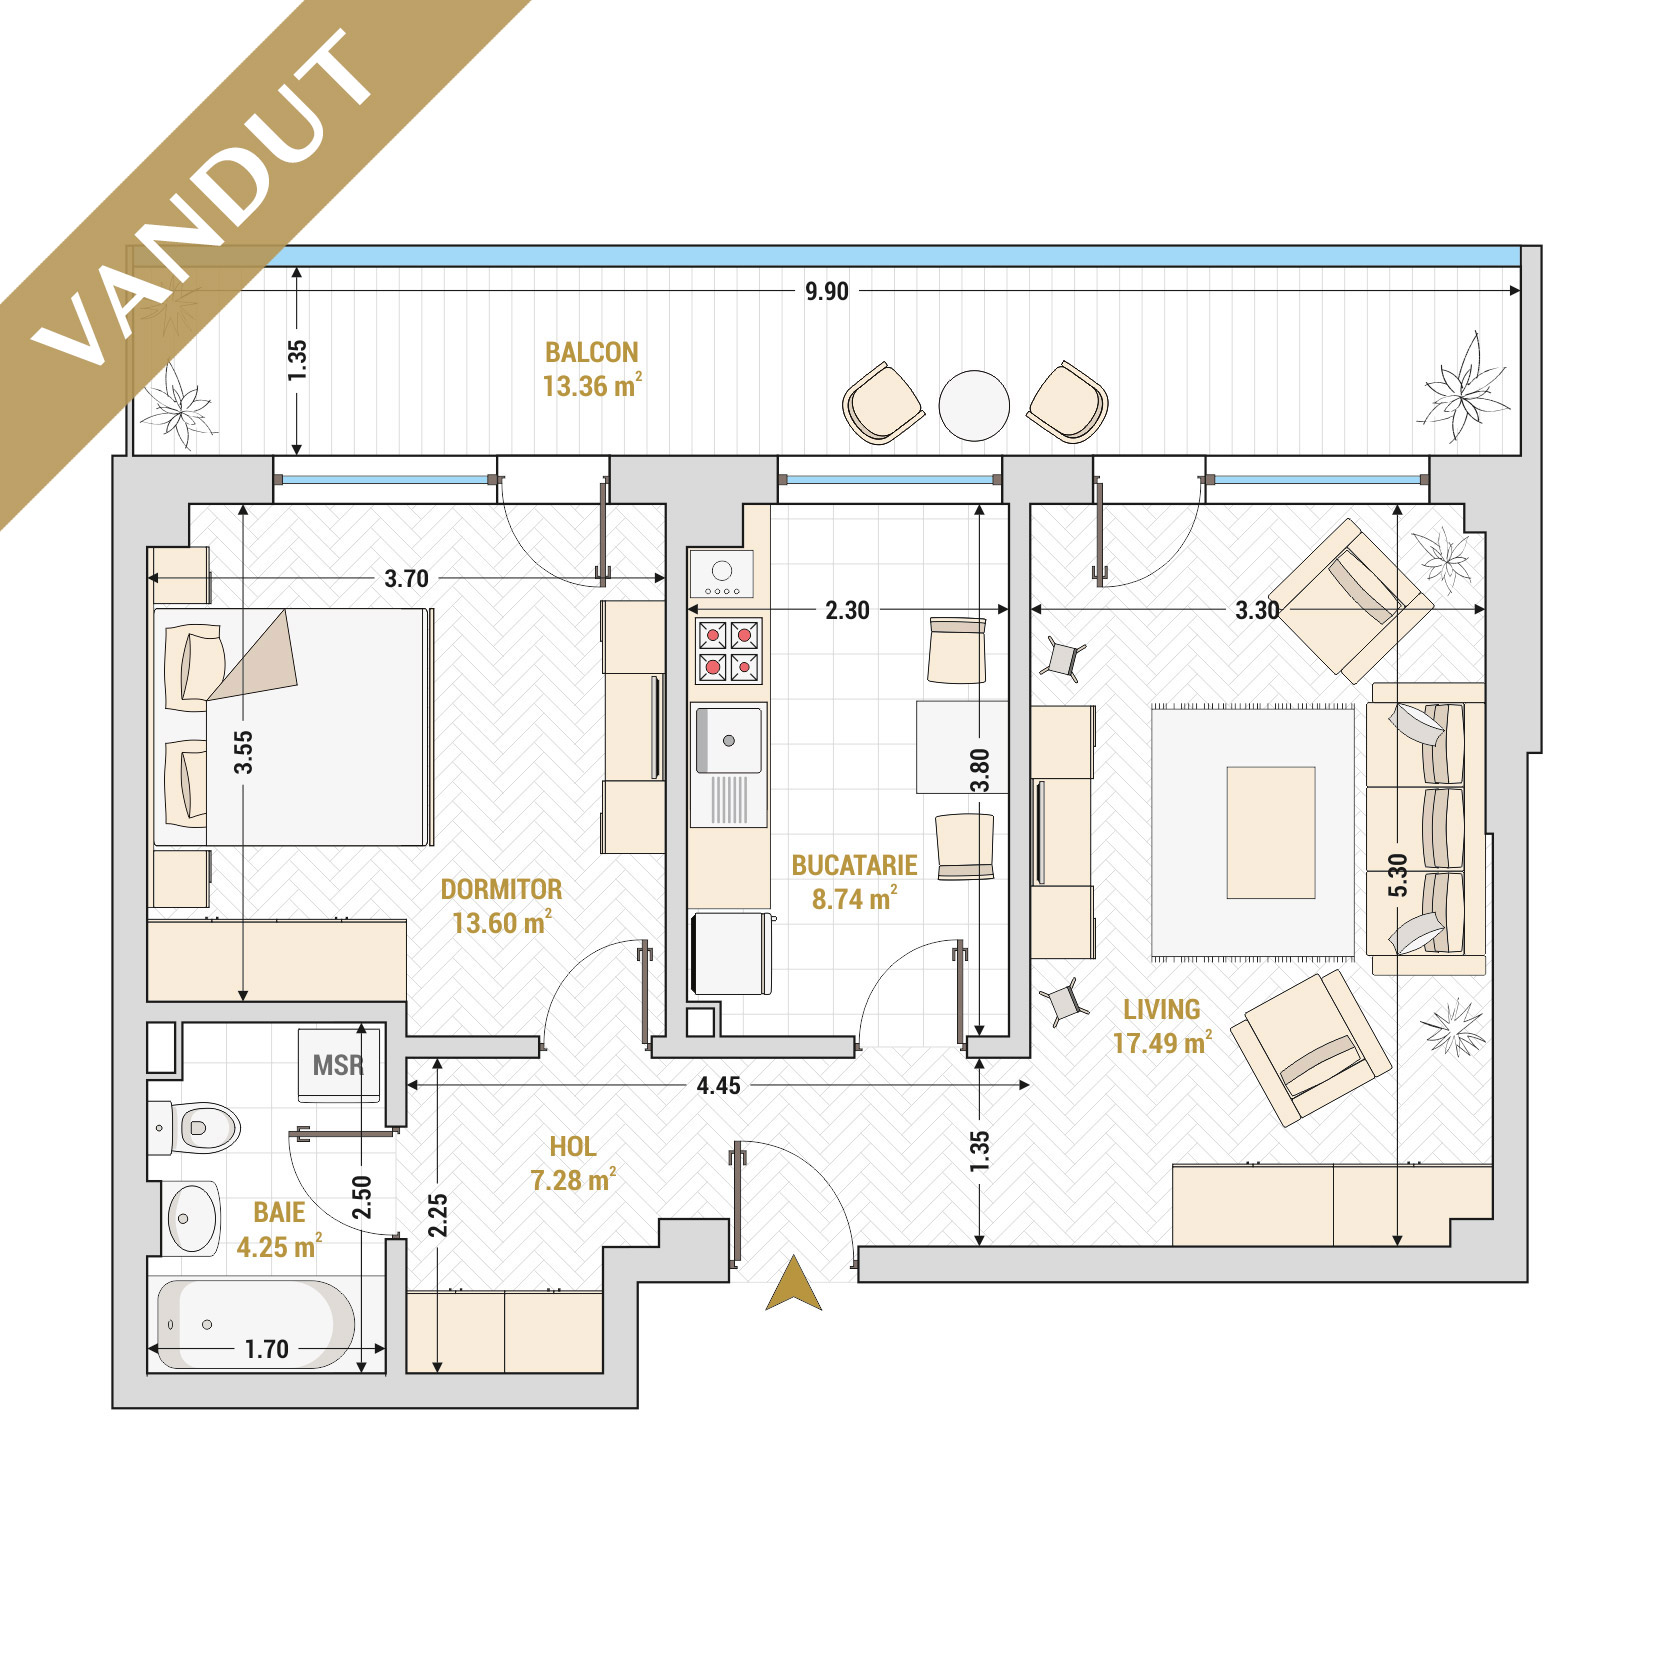 Apartament 2 camere de vanzare Bucuresti - Catedral Residence - Marriott, Piata Unirii, 13 Septembrie, Izvor - Tip 4 - T2 - V